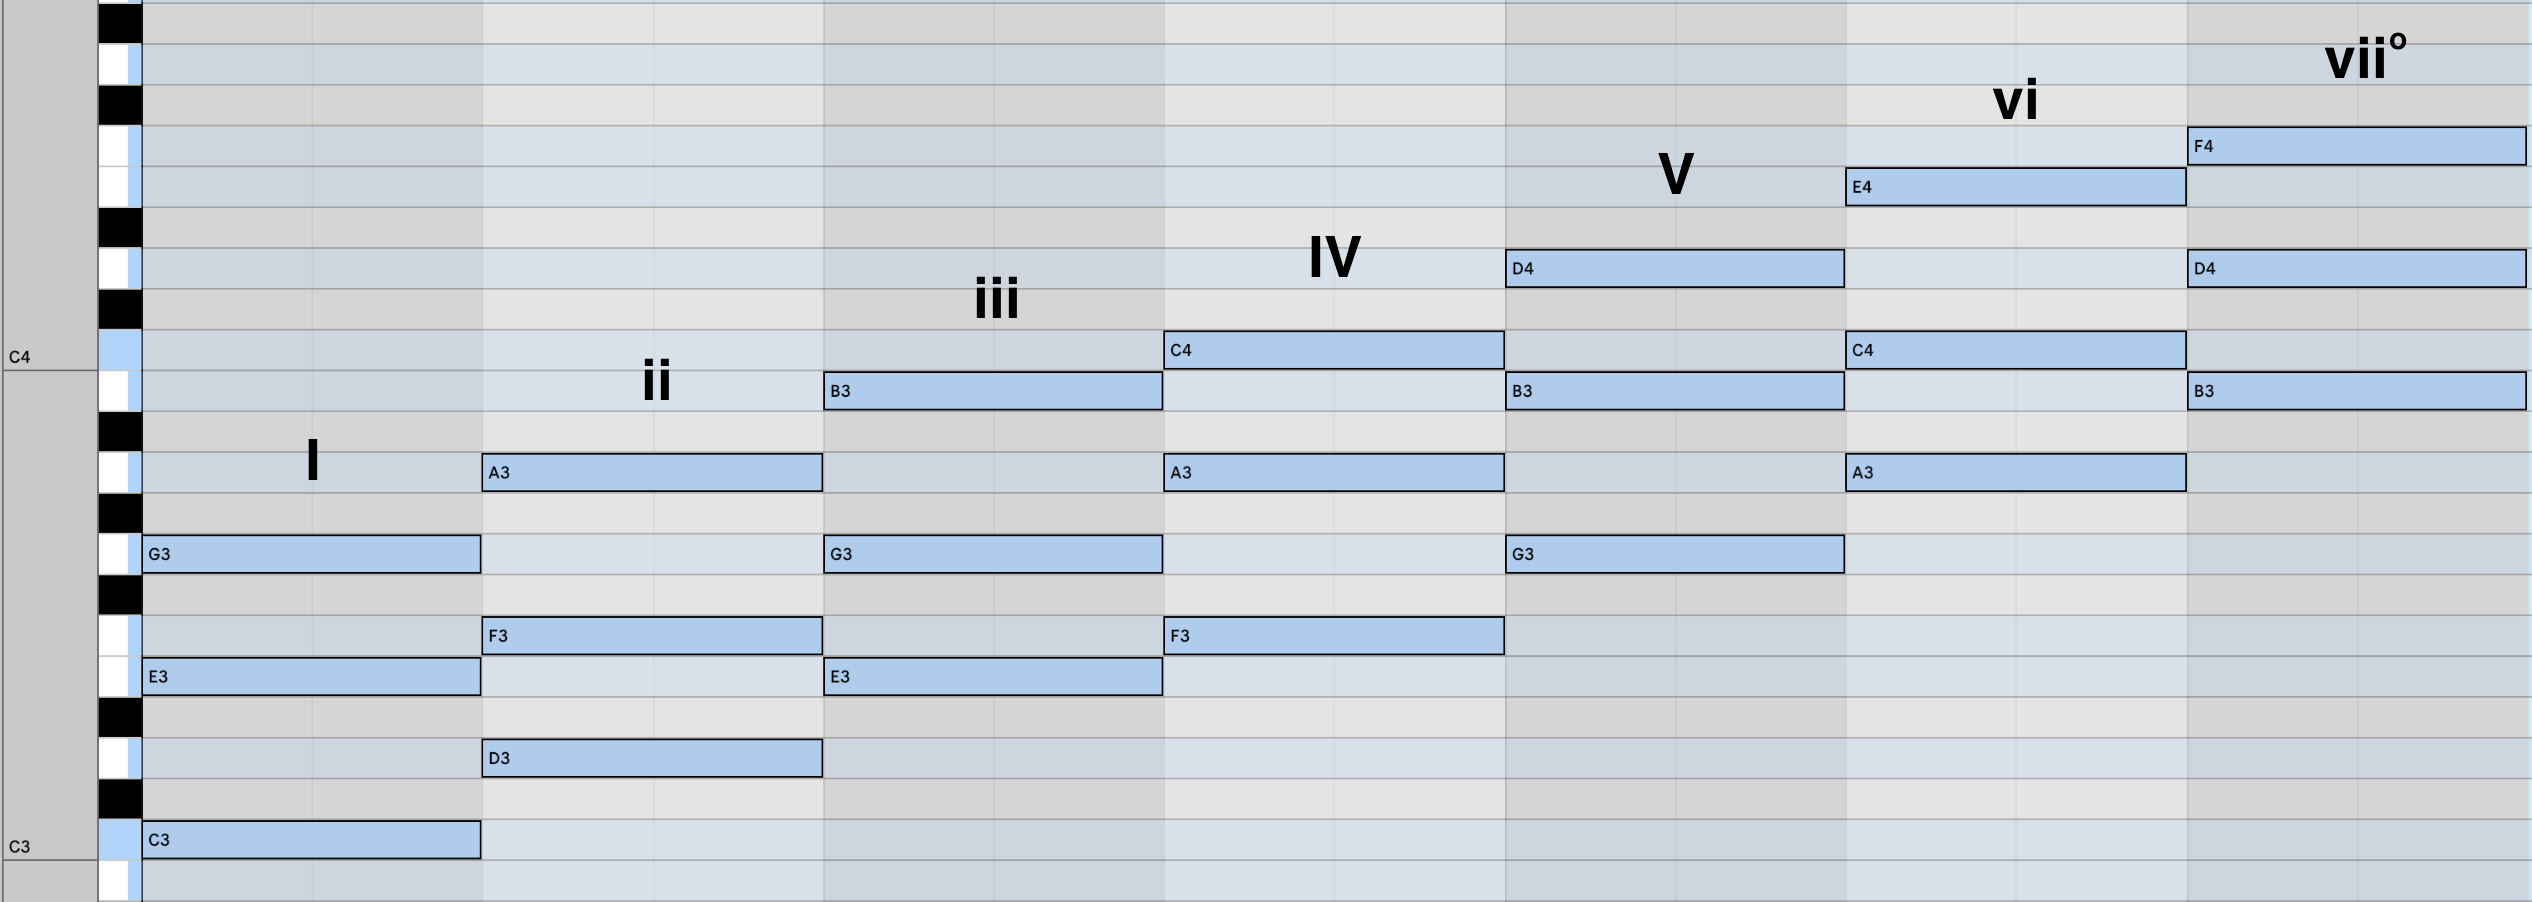 diatonic-chords-c-major-roman-numerals